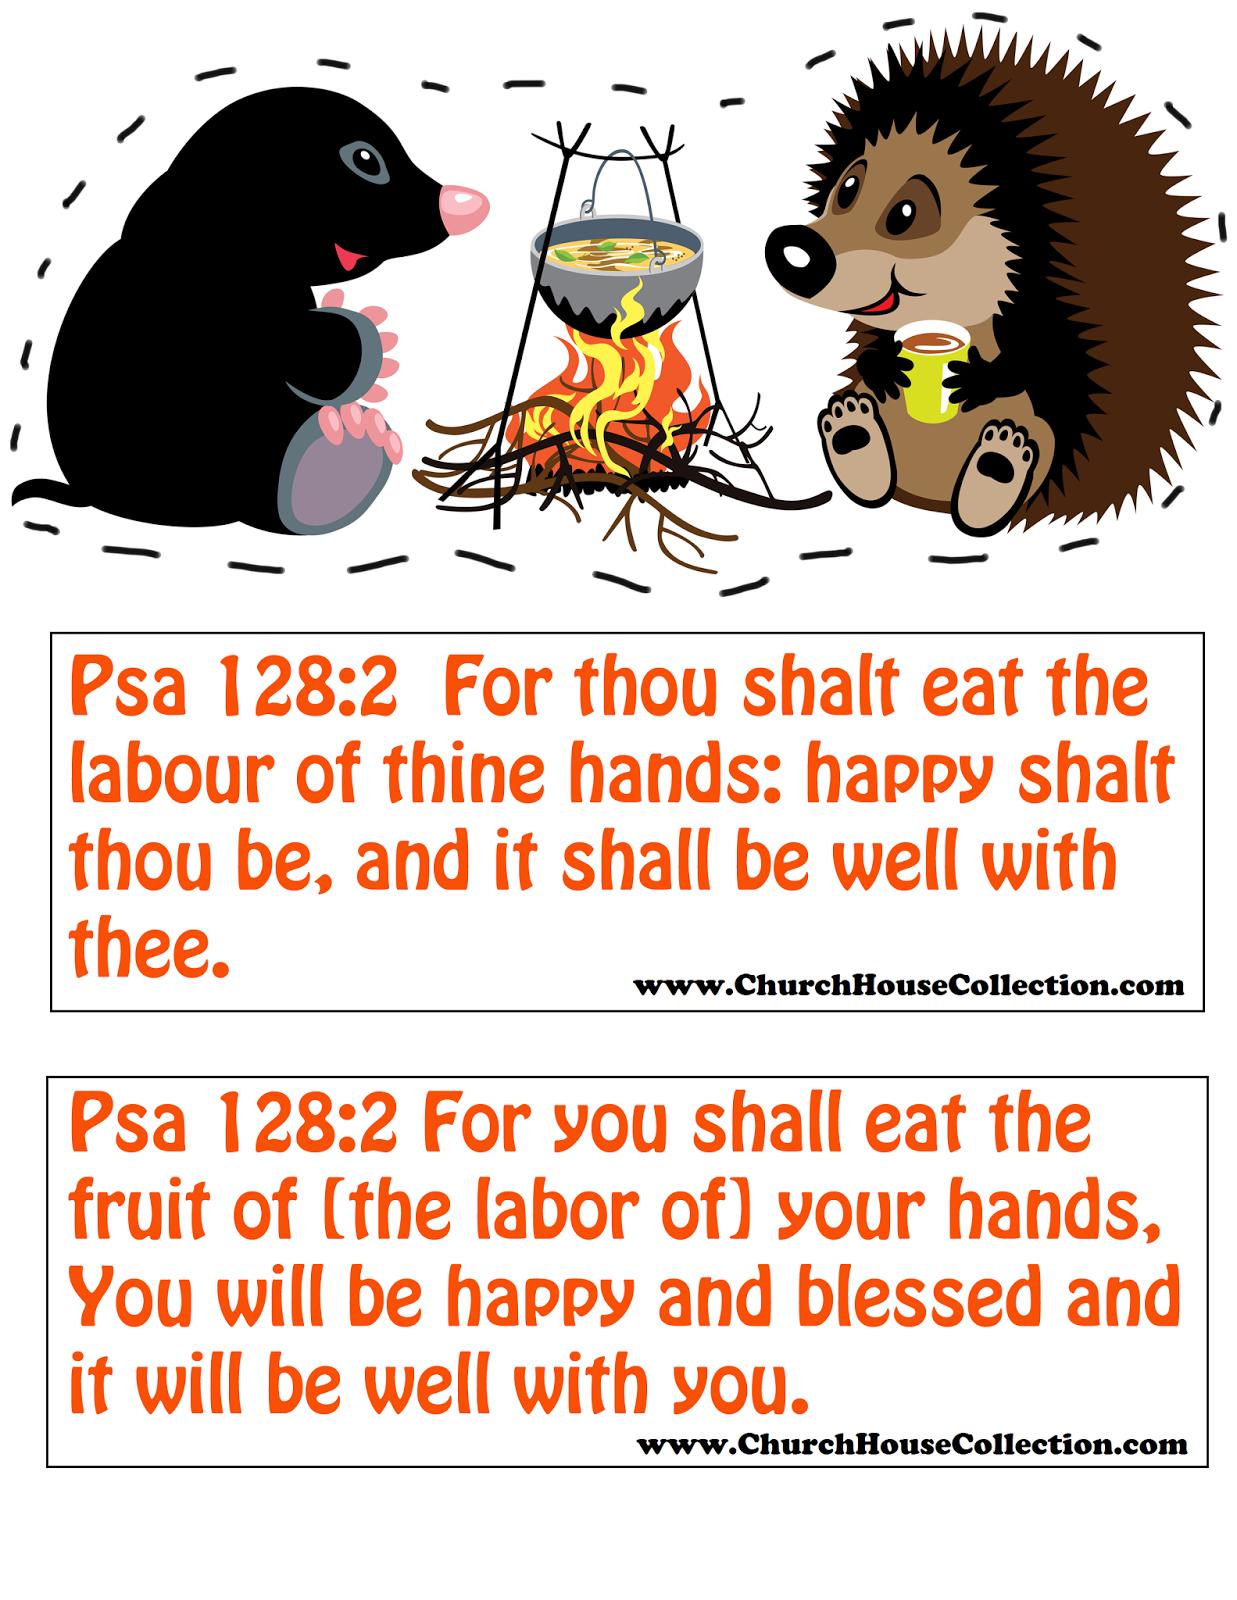 Church House Collection Blog Mole And Hedgehog Cutout